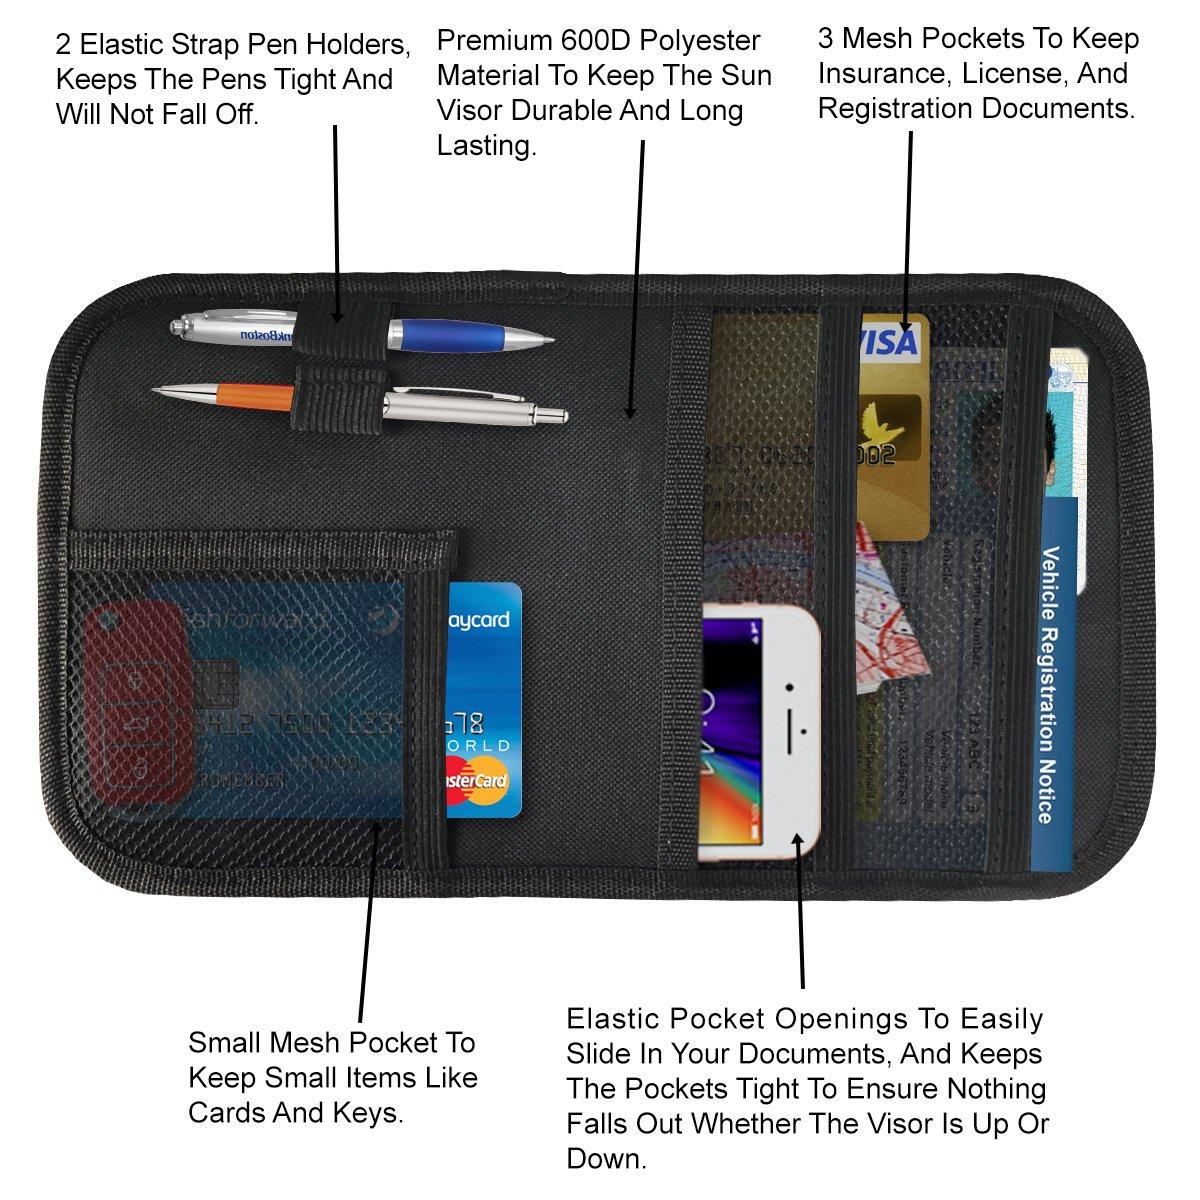 Personal Belonging Storage Pouch Organizer 2 Pack Auto Interior Accessories Pocket Organizer Registration and Document Holder lebogner Car Sun Visor Organizer